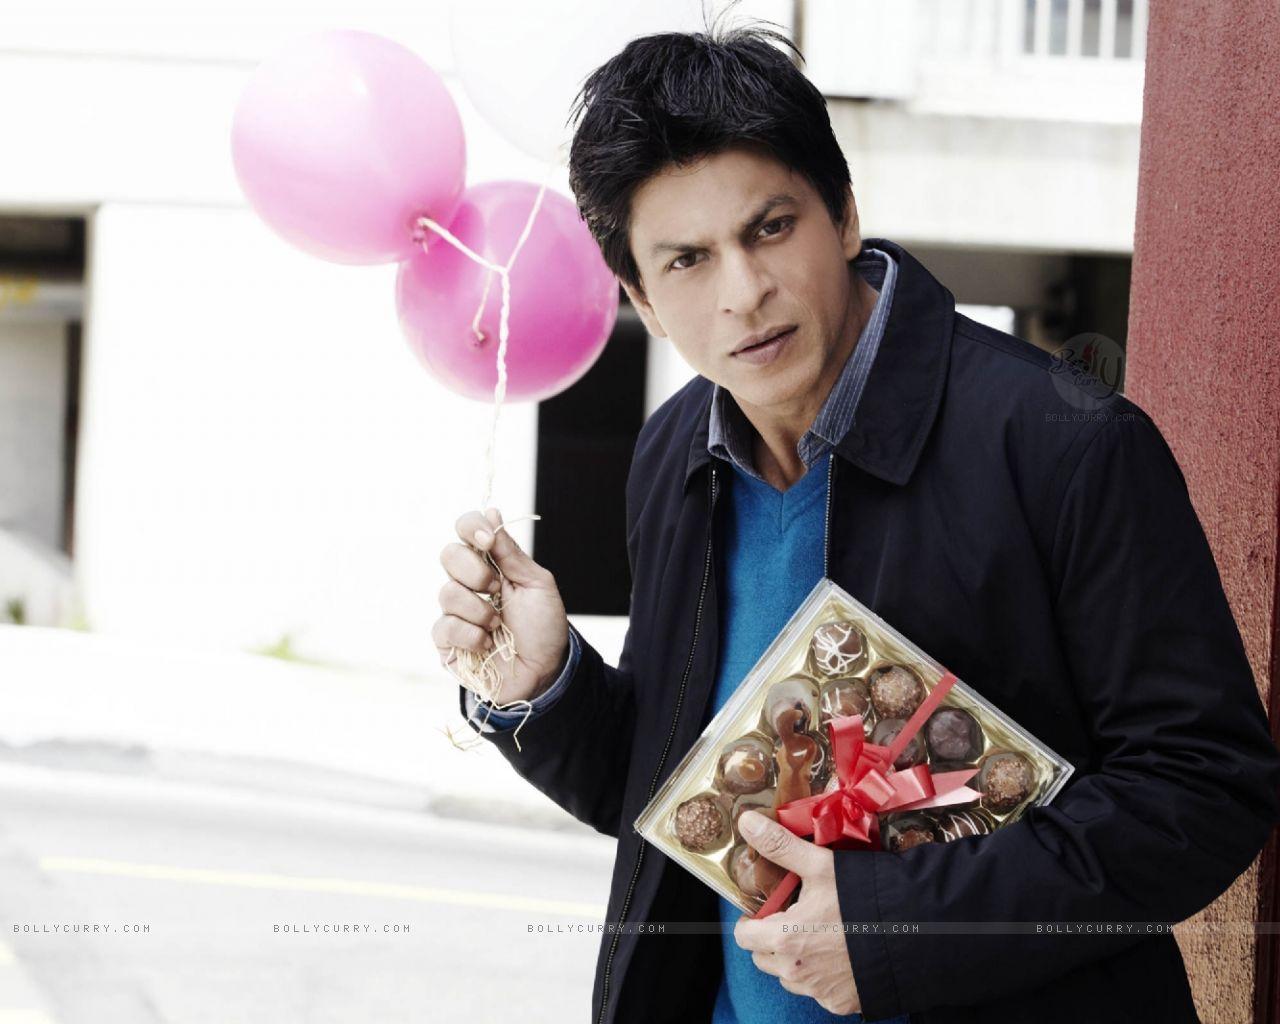 40295-shahrukh-khan-in-the-movie-my-name-is-khan